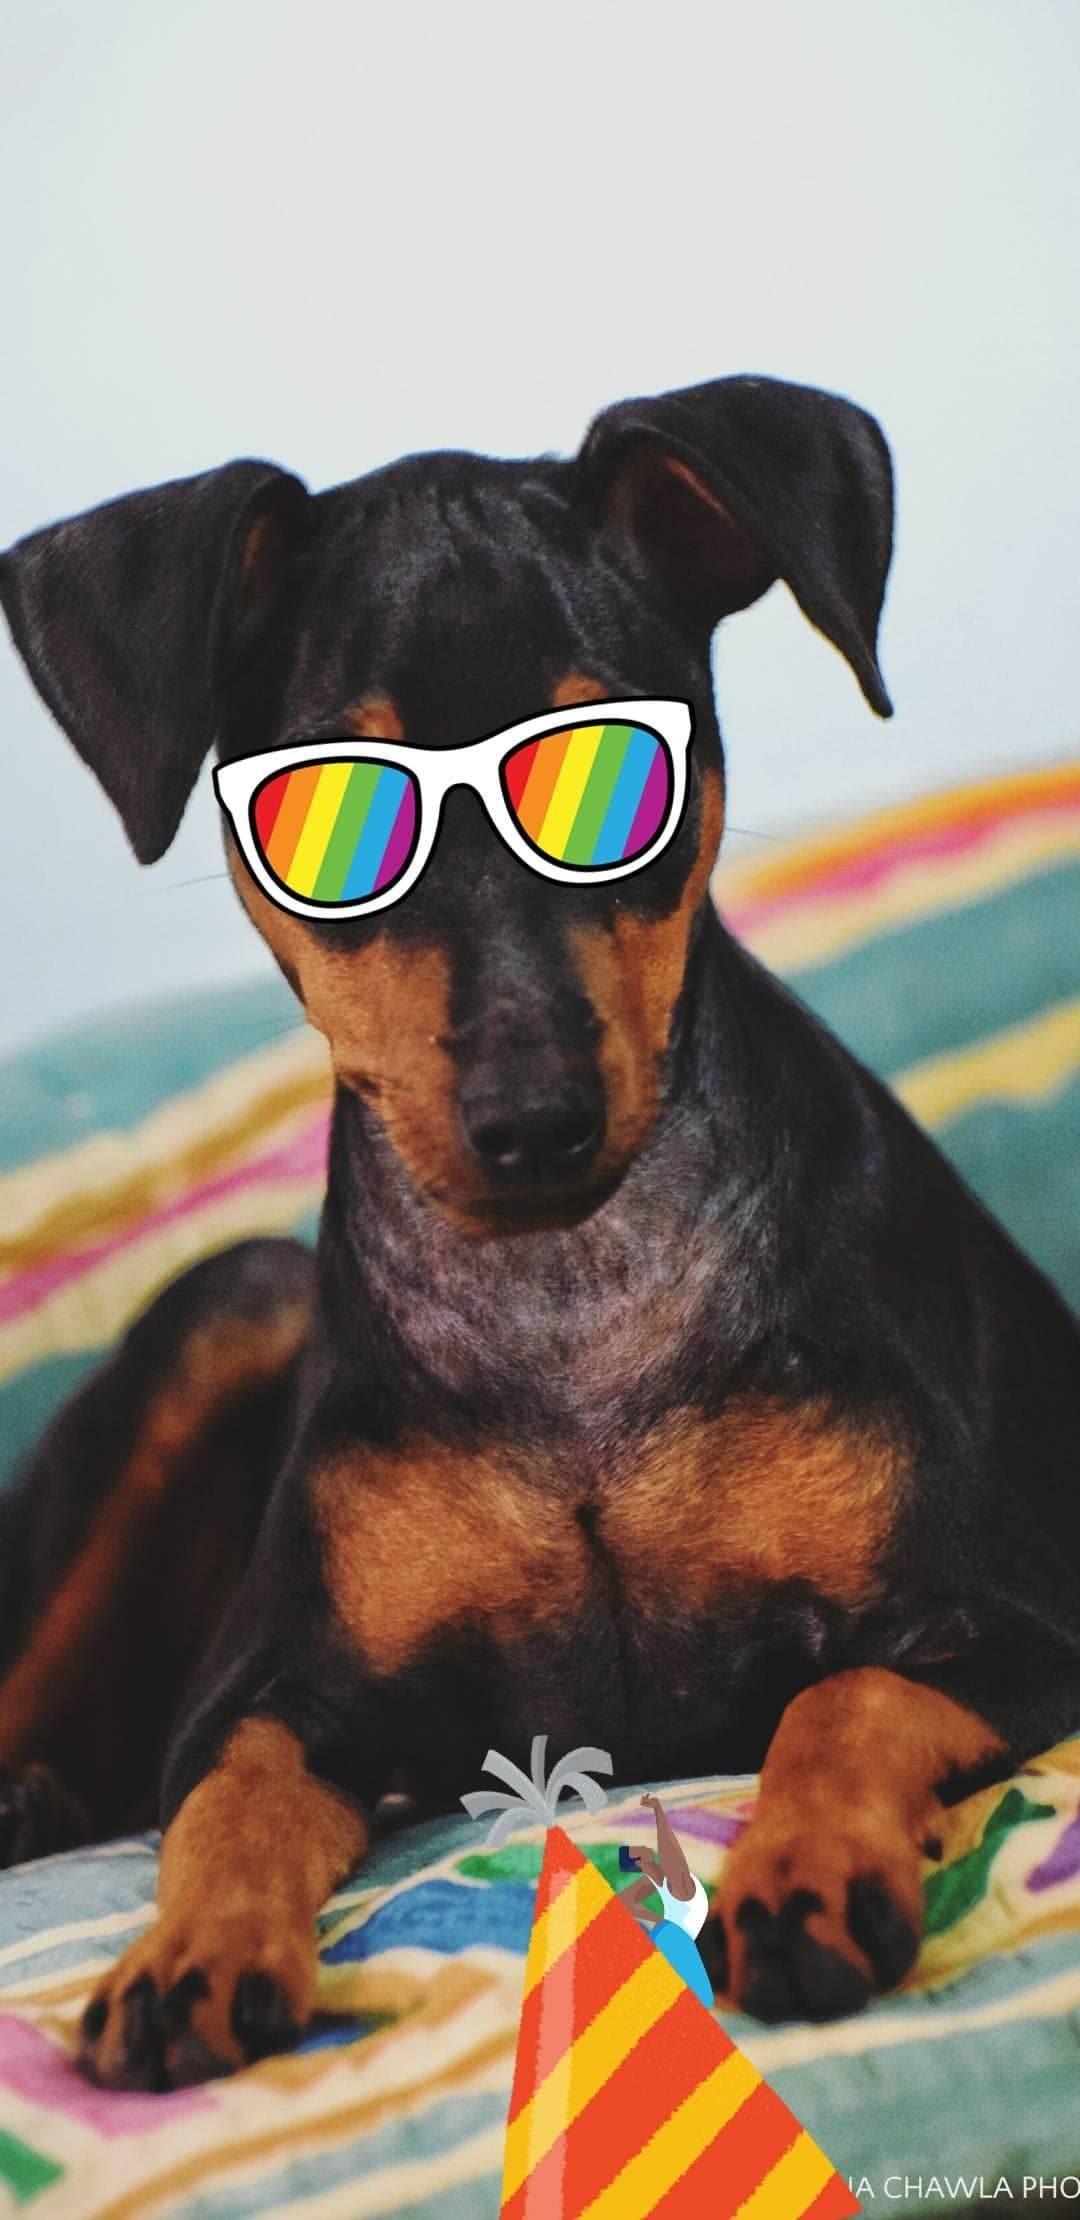 Mr Polo 🐶 #dog #small #little #polo #cute #wednesday #portrait #doglife #dogstyle #🐶 #minpin #love #fun #Nikon #dogs #dogsofinstagram #doğum #toybread #innocent #👋RC